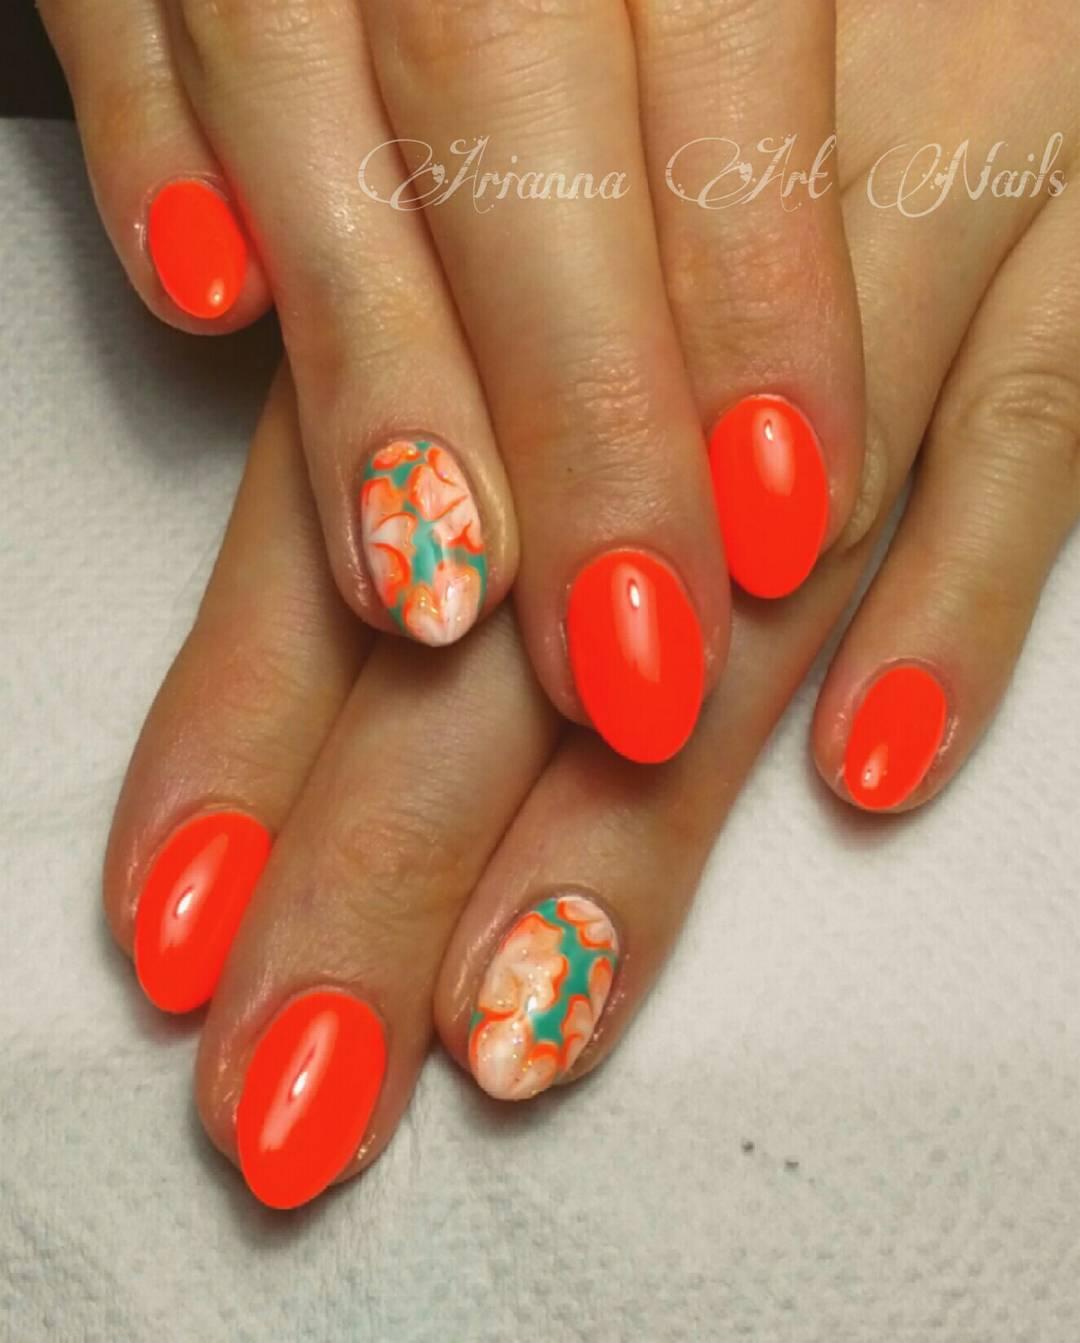 Artistic Floral Nails In Orange